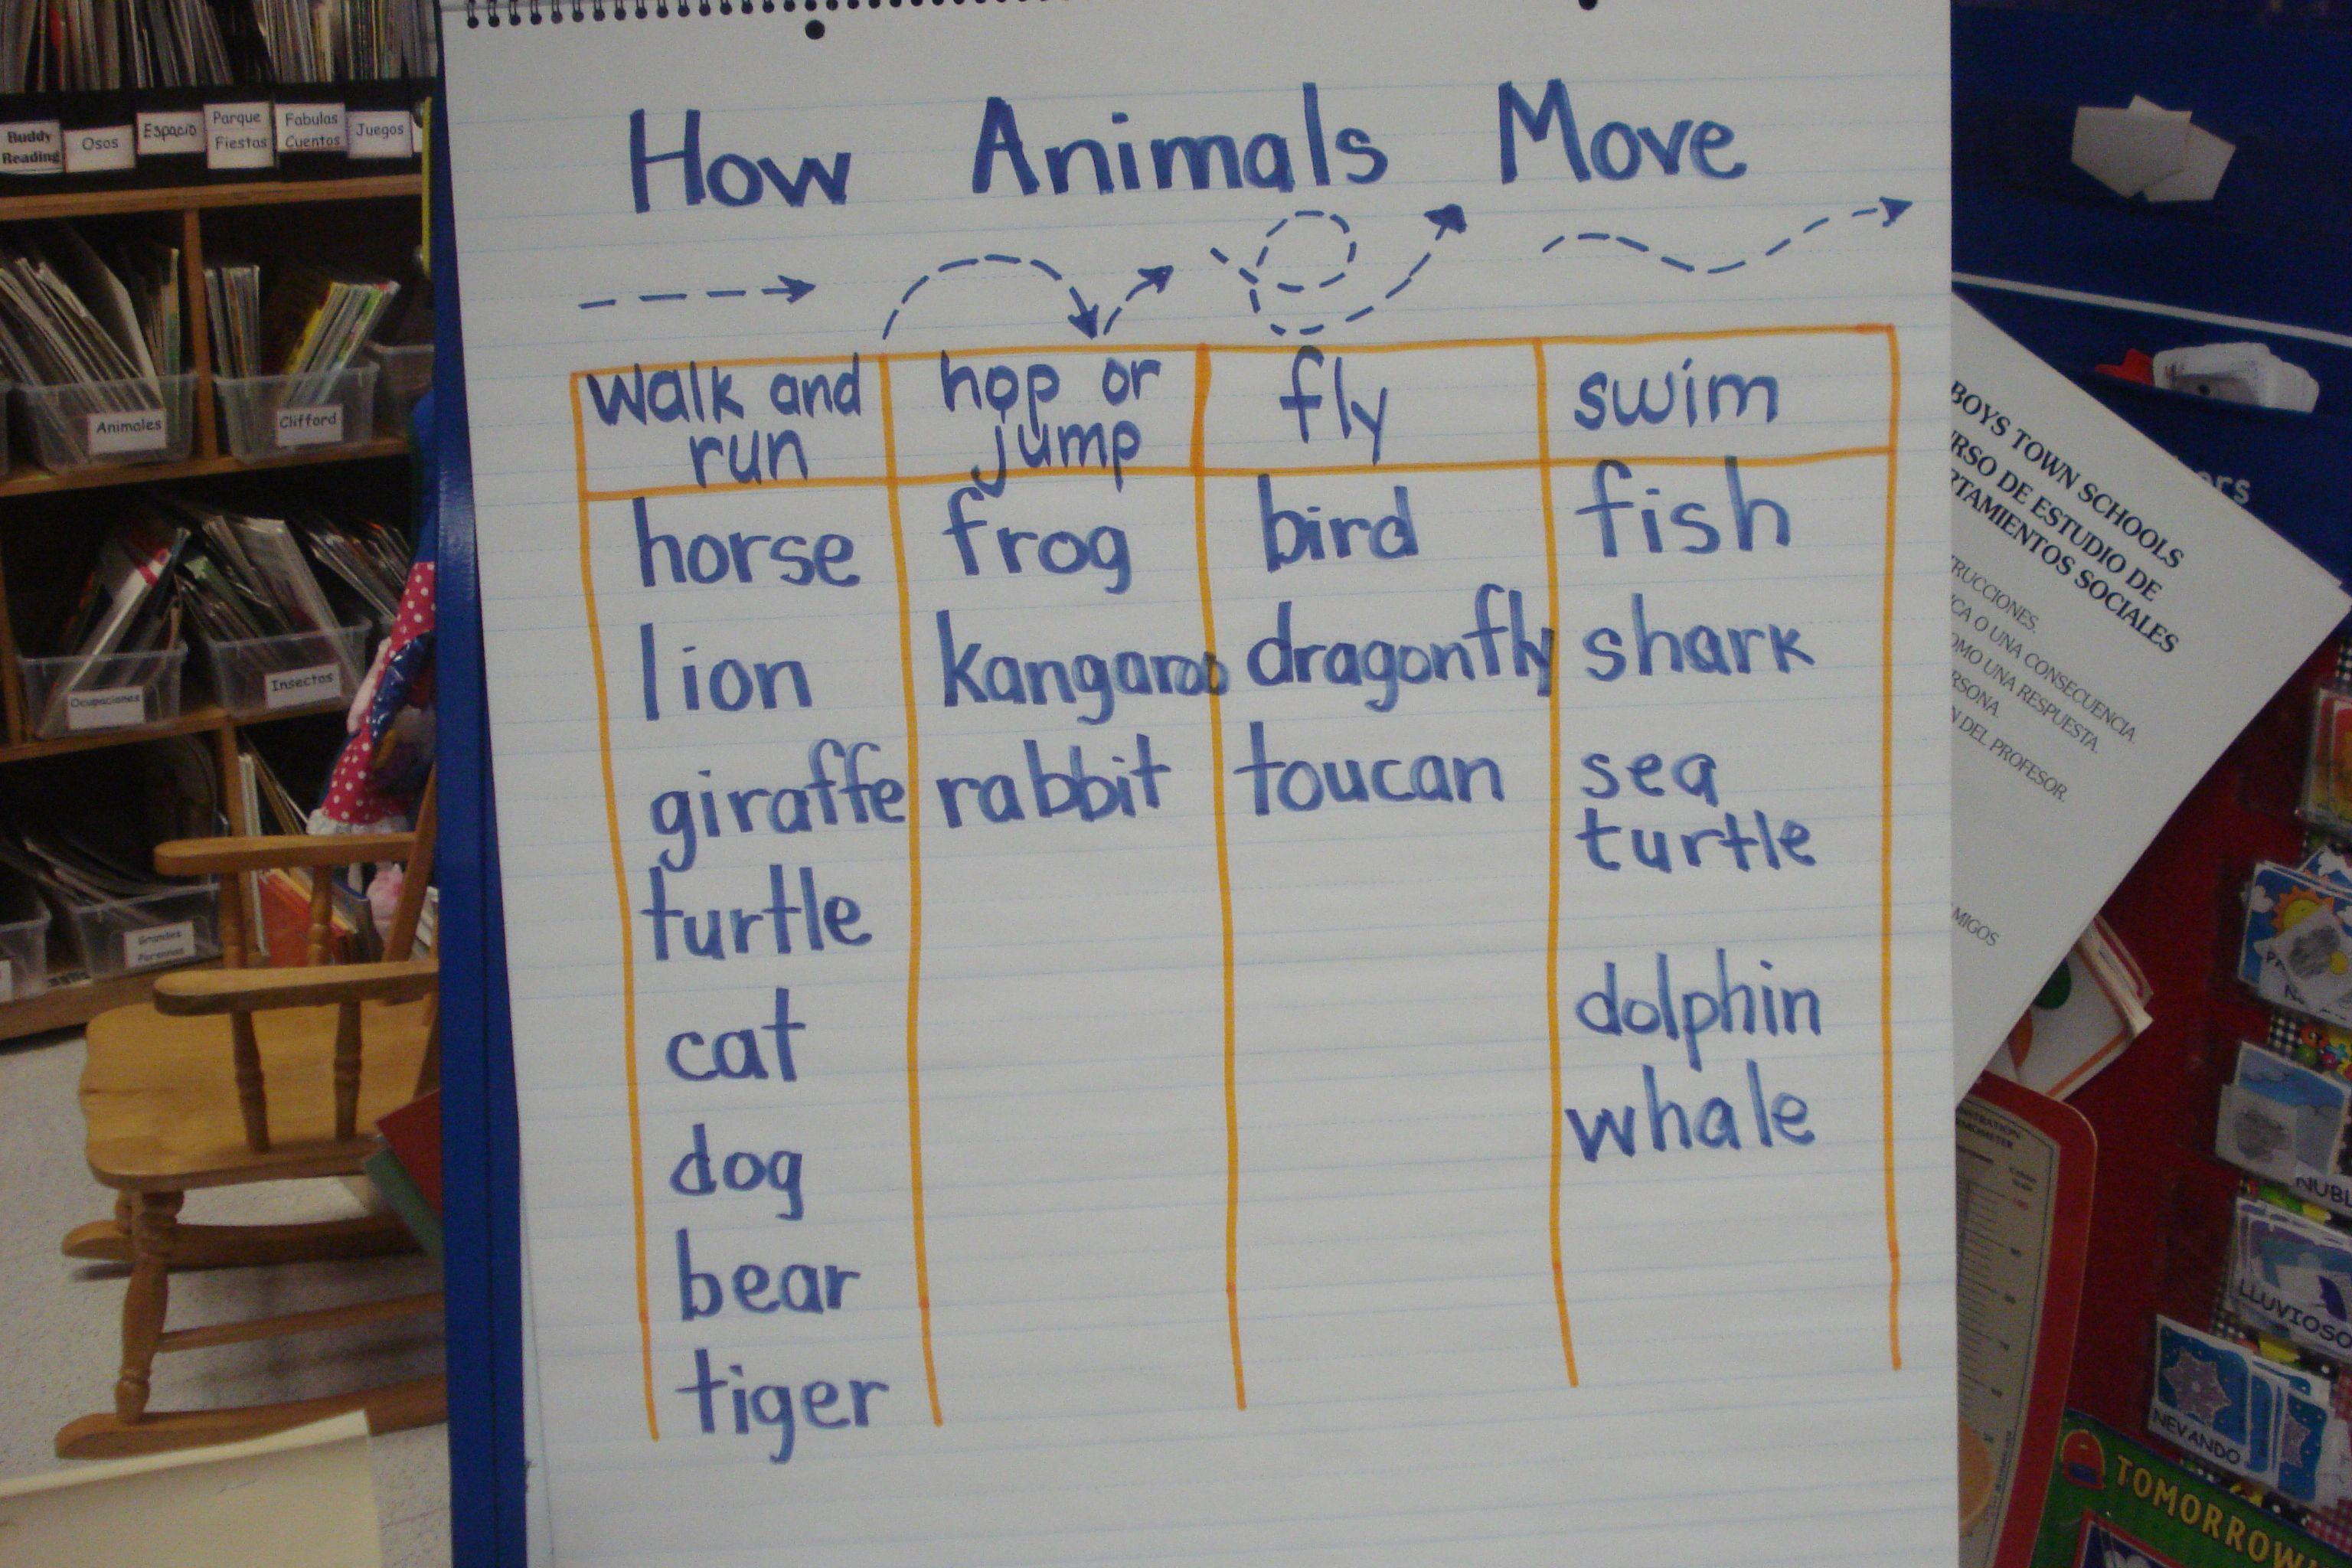 Pin on Animals' Characteristics